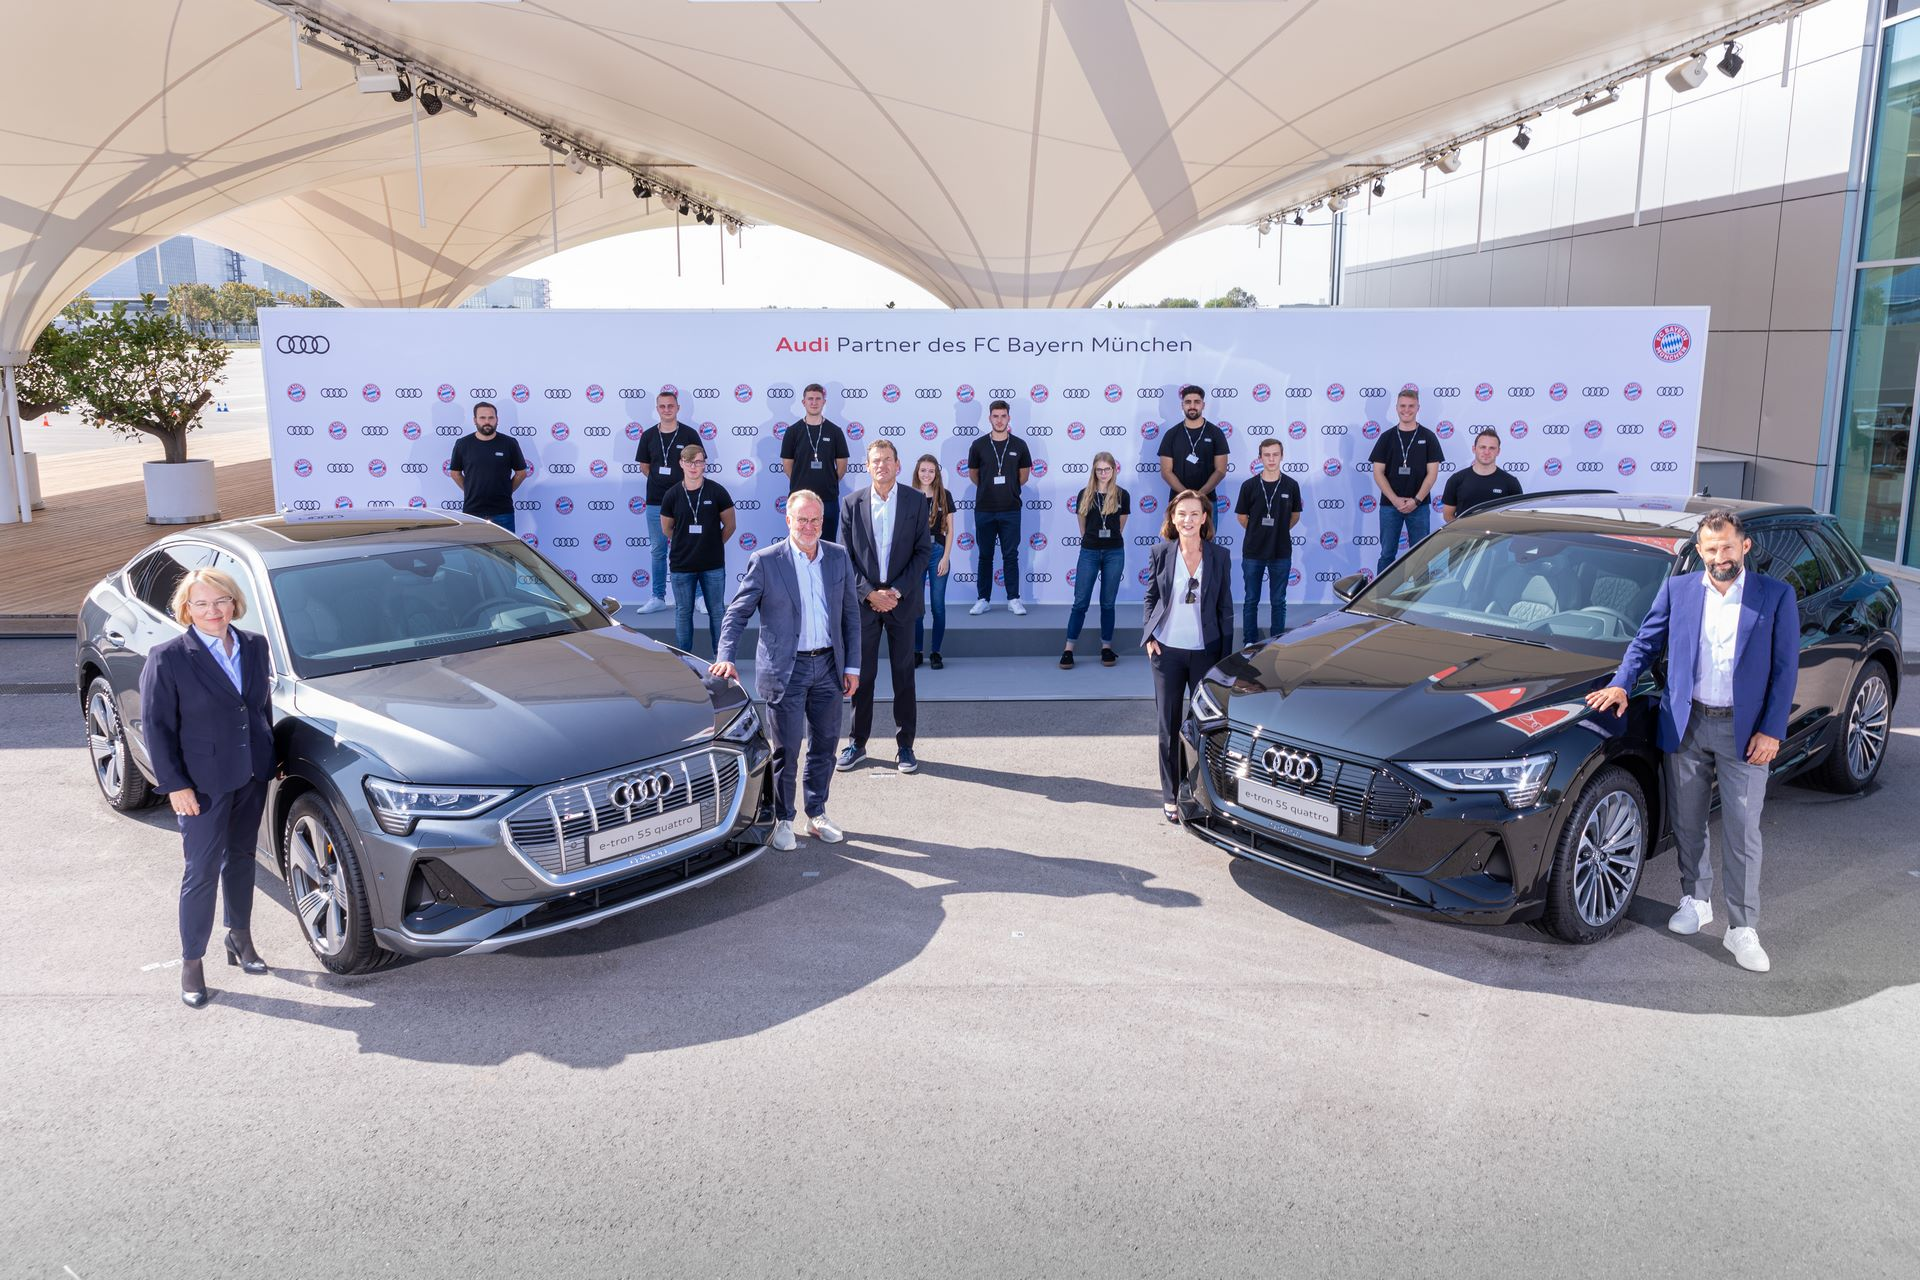 Audi electrifies FC Bayern Munich